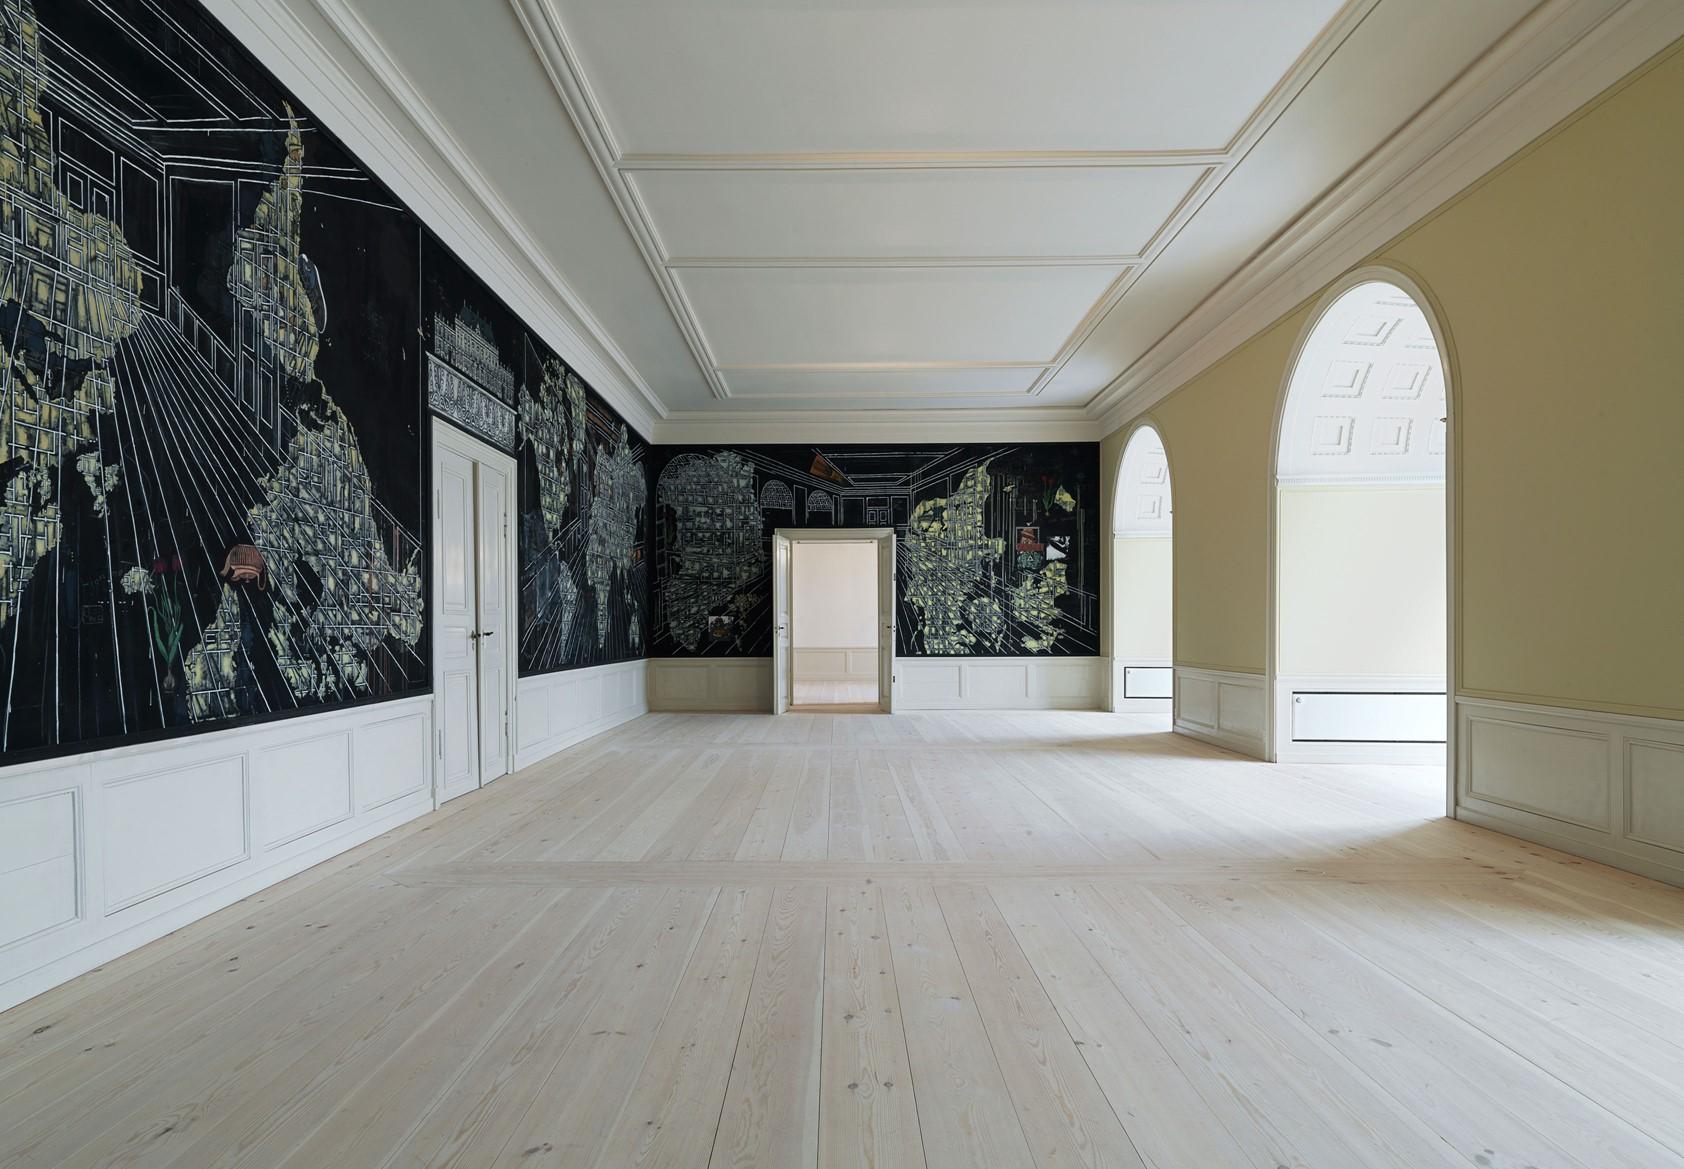 pine-plank-floor-restoration_natural-soap_amalienborg-slot_dinesen.jpg